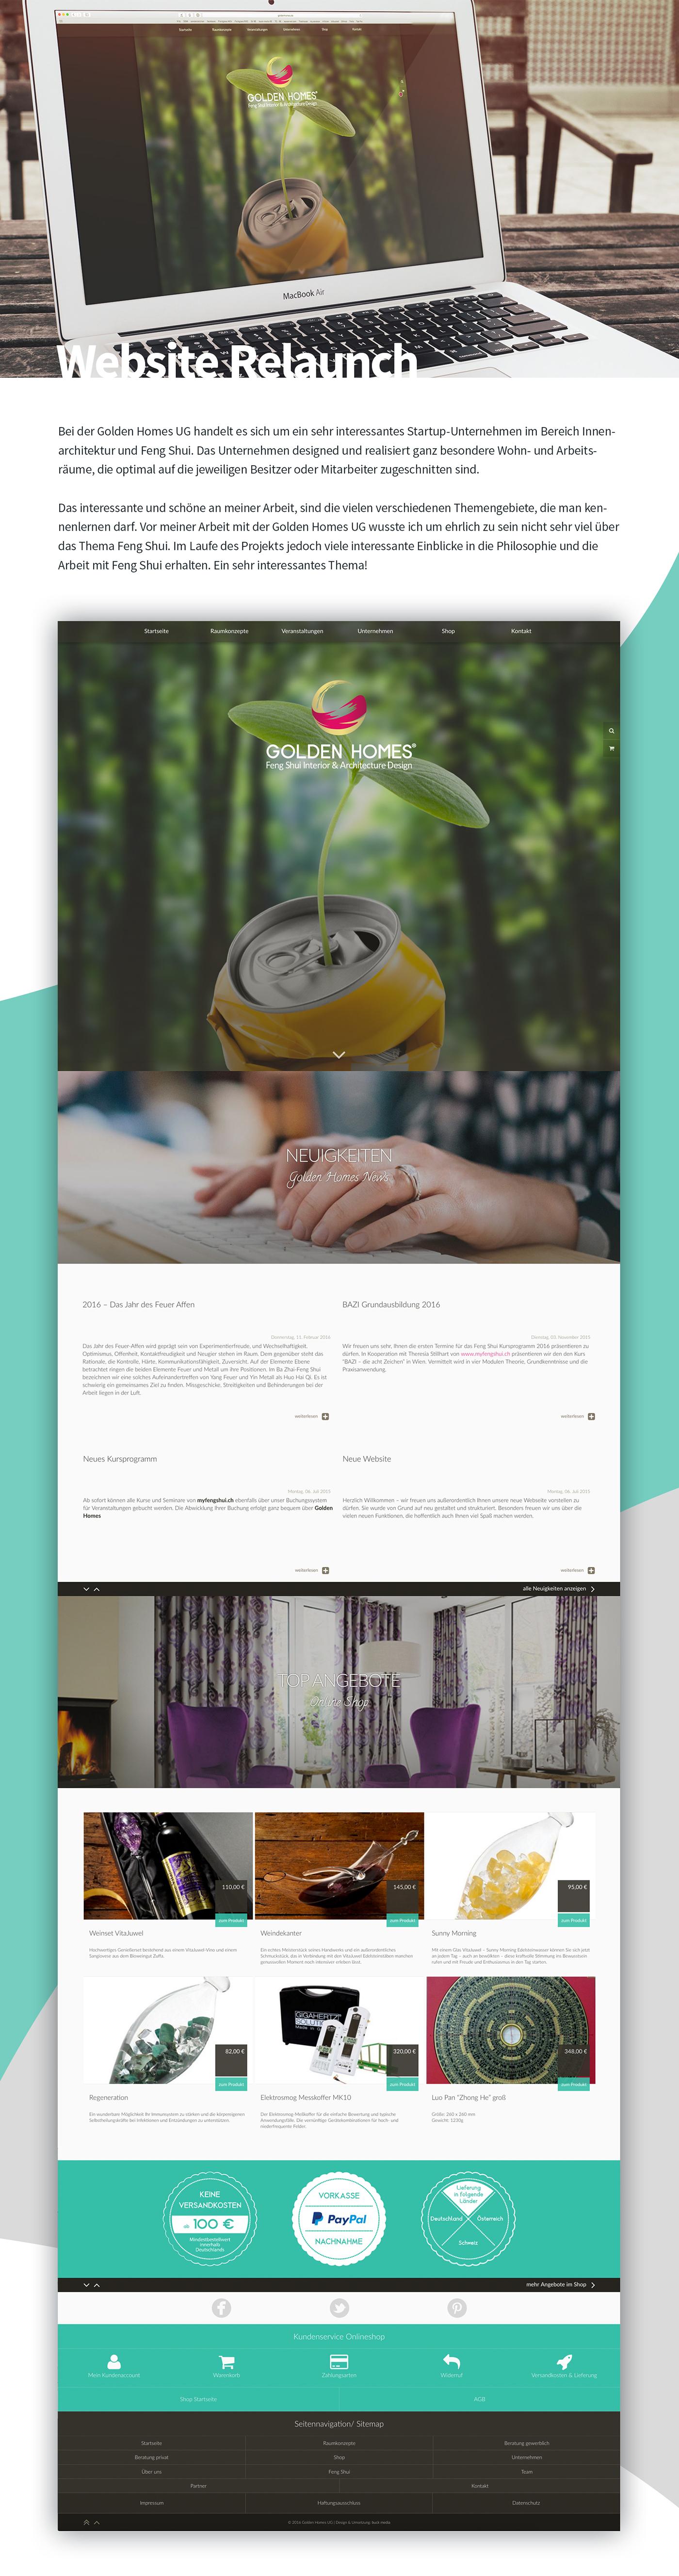 relaunch,redesign,Screendesign,development,wordpress,Online shop,buck media